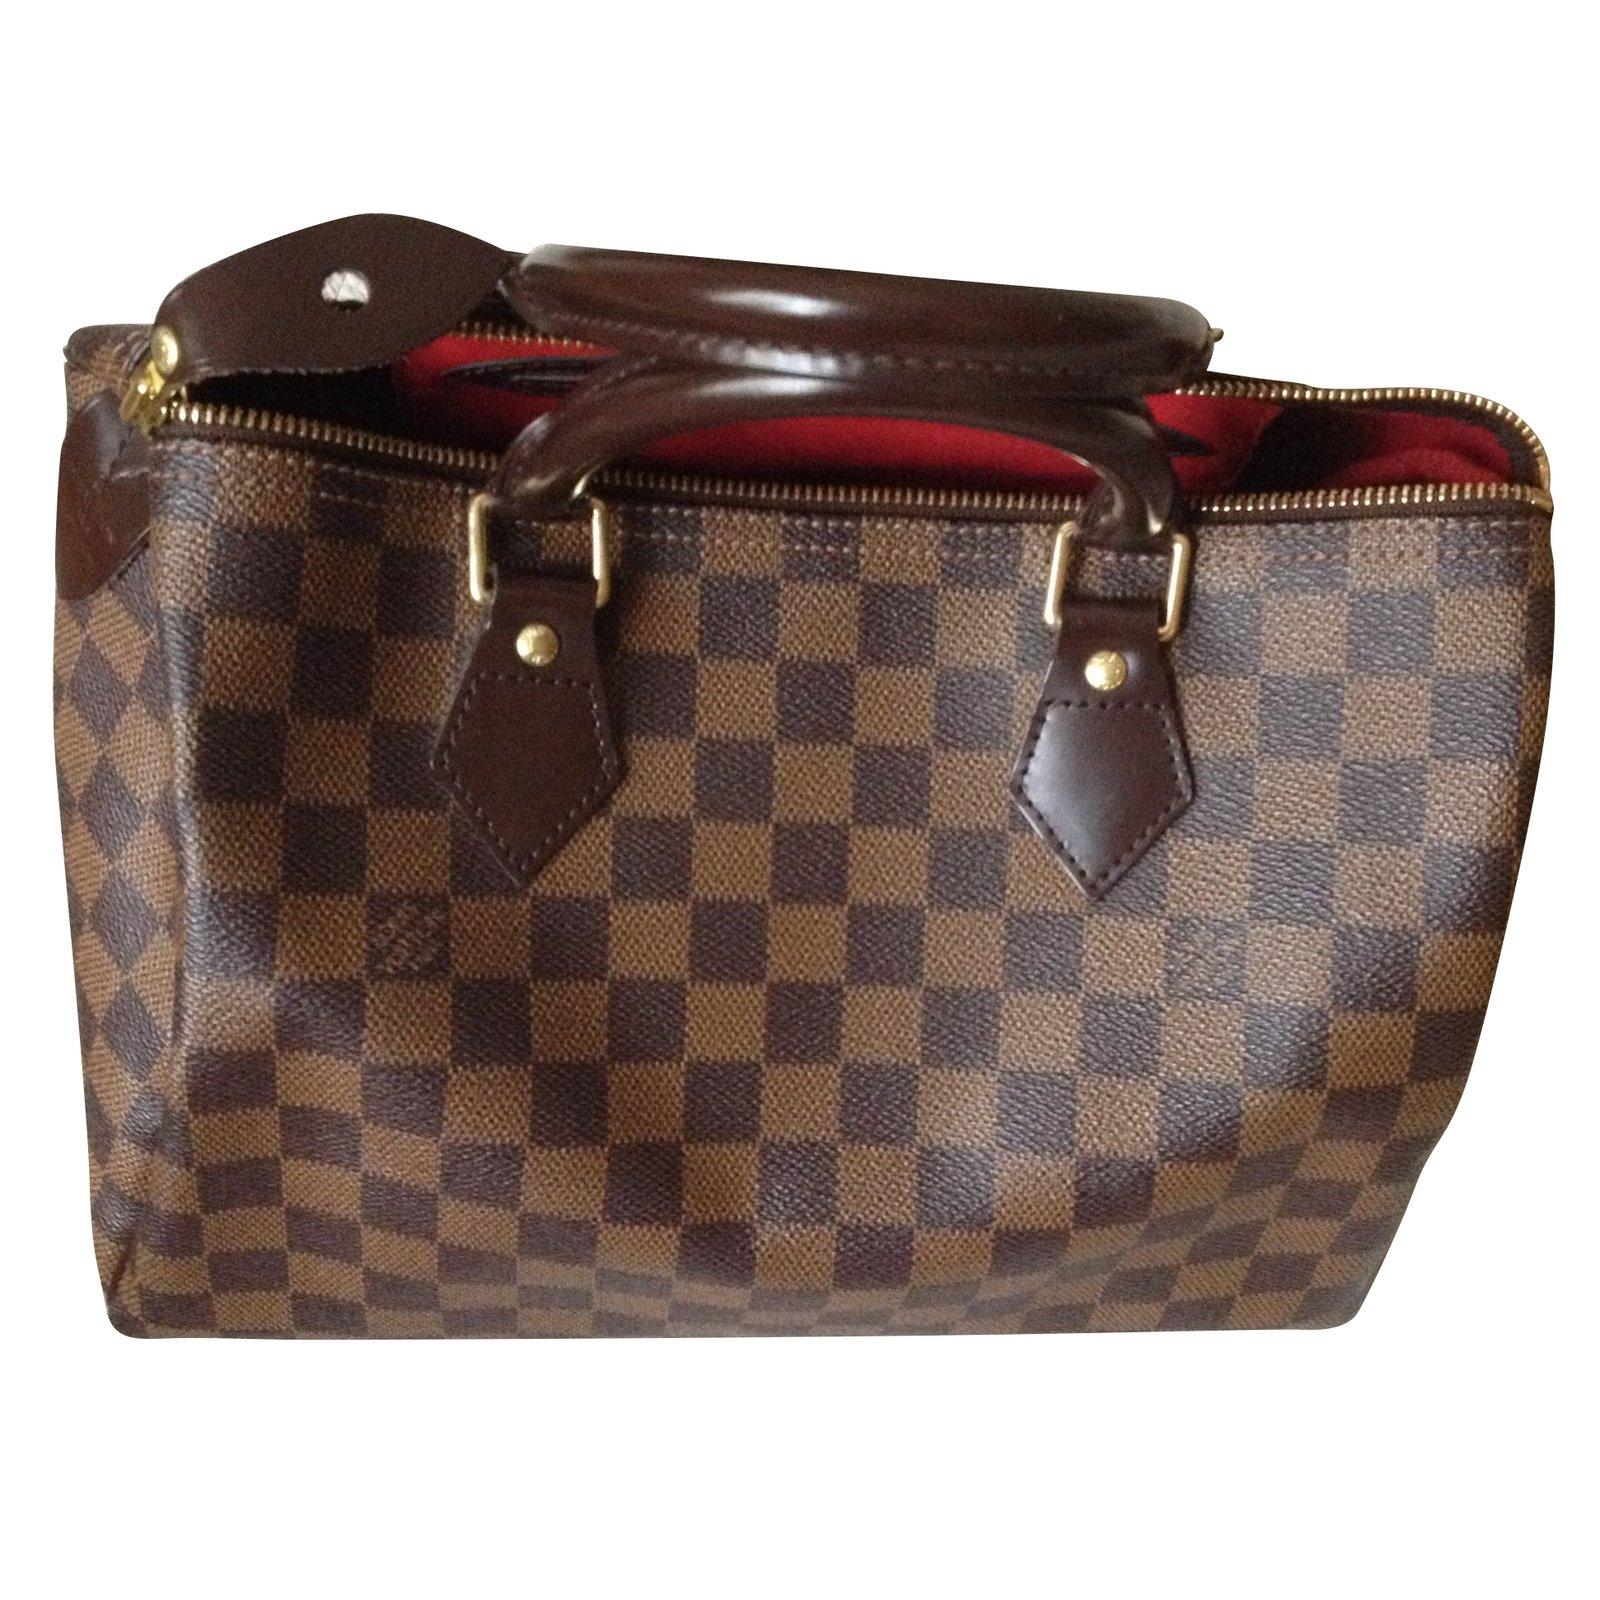 617aaadc8b35 Louis Vuitton Speedy damier ébène 30 Handbags Leather Brown ref.54522